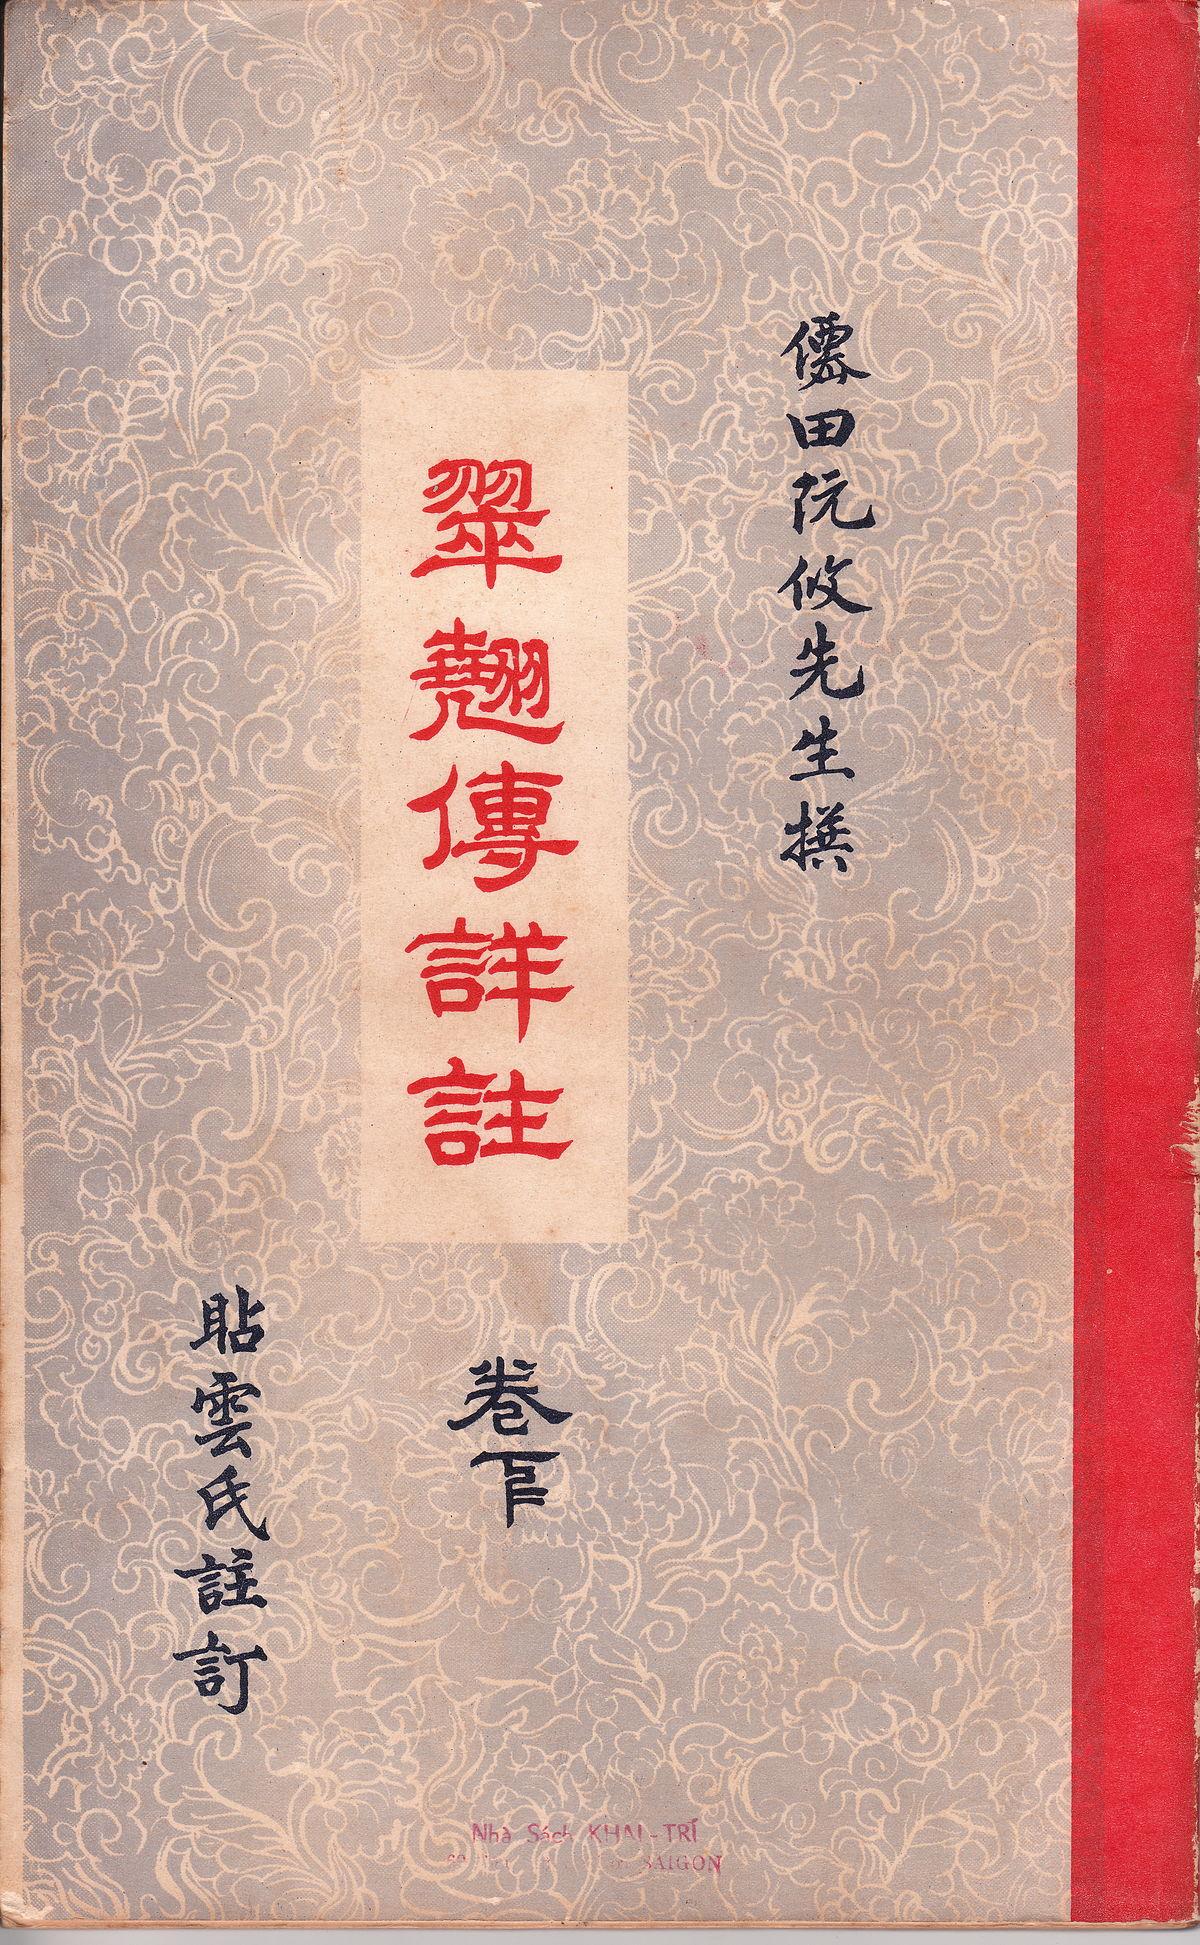 The Tale of Kieu - Wikipedia